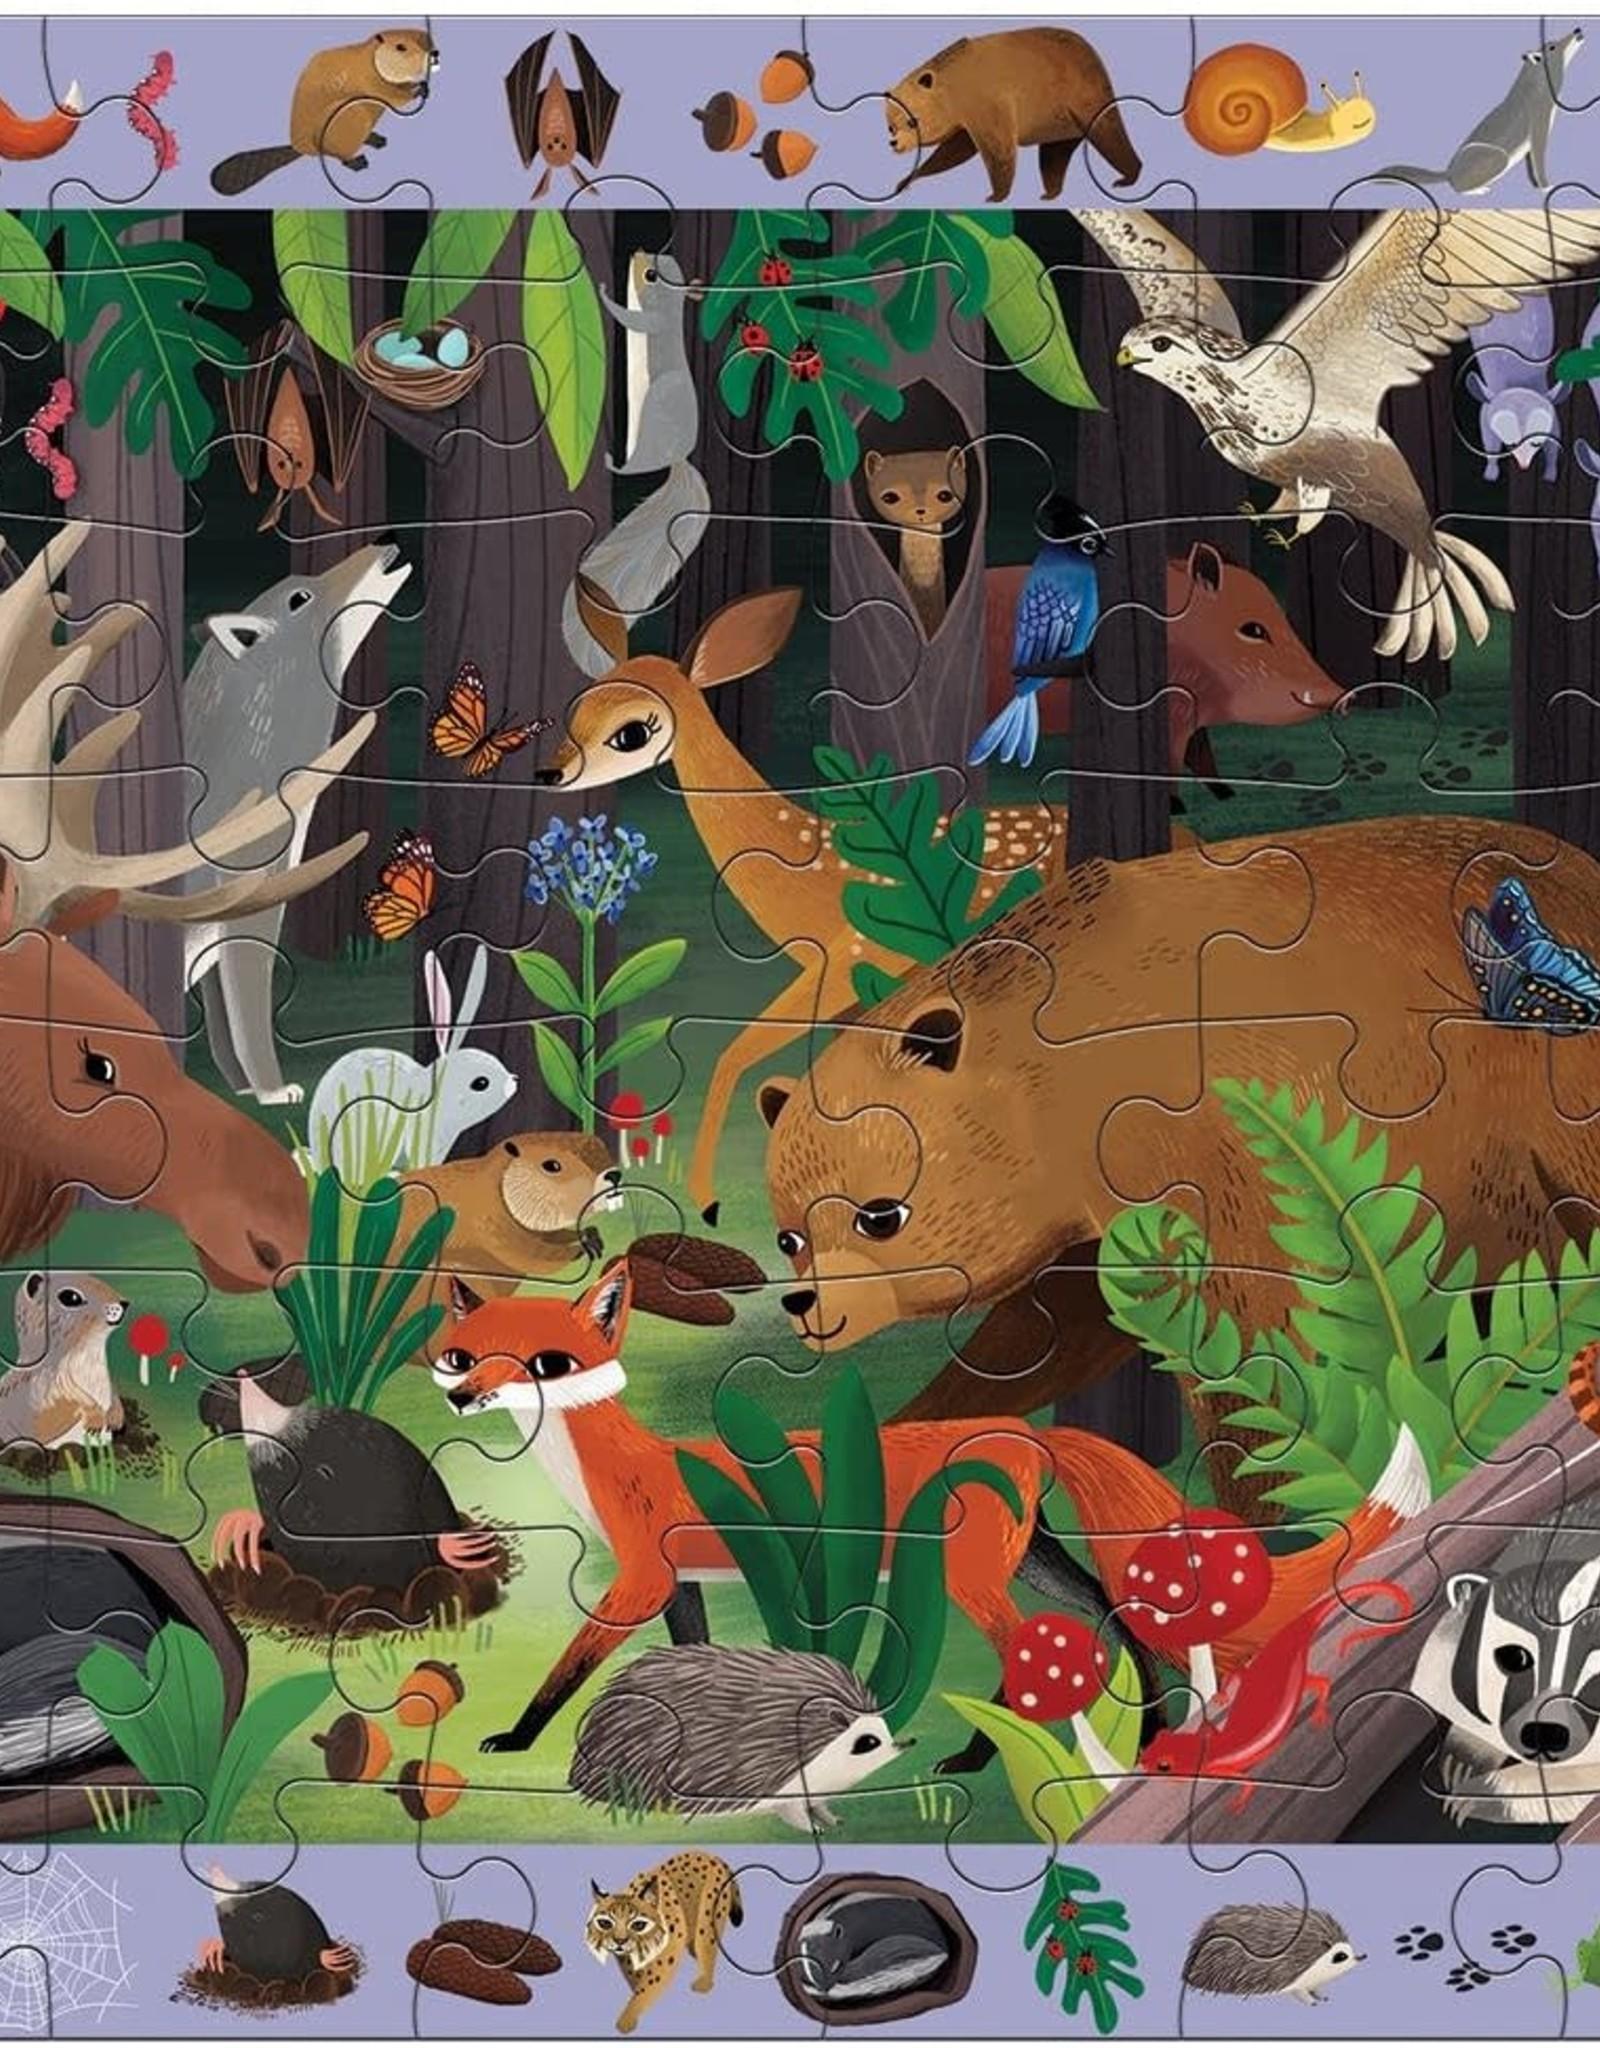 Mudpuppy Search & Find Puzzle - Woodland